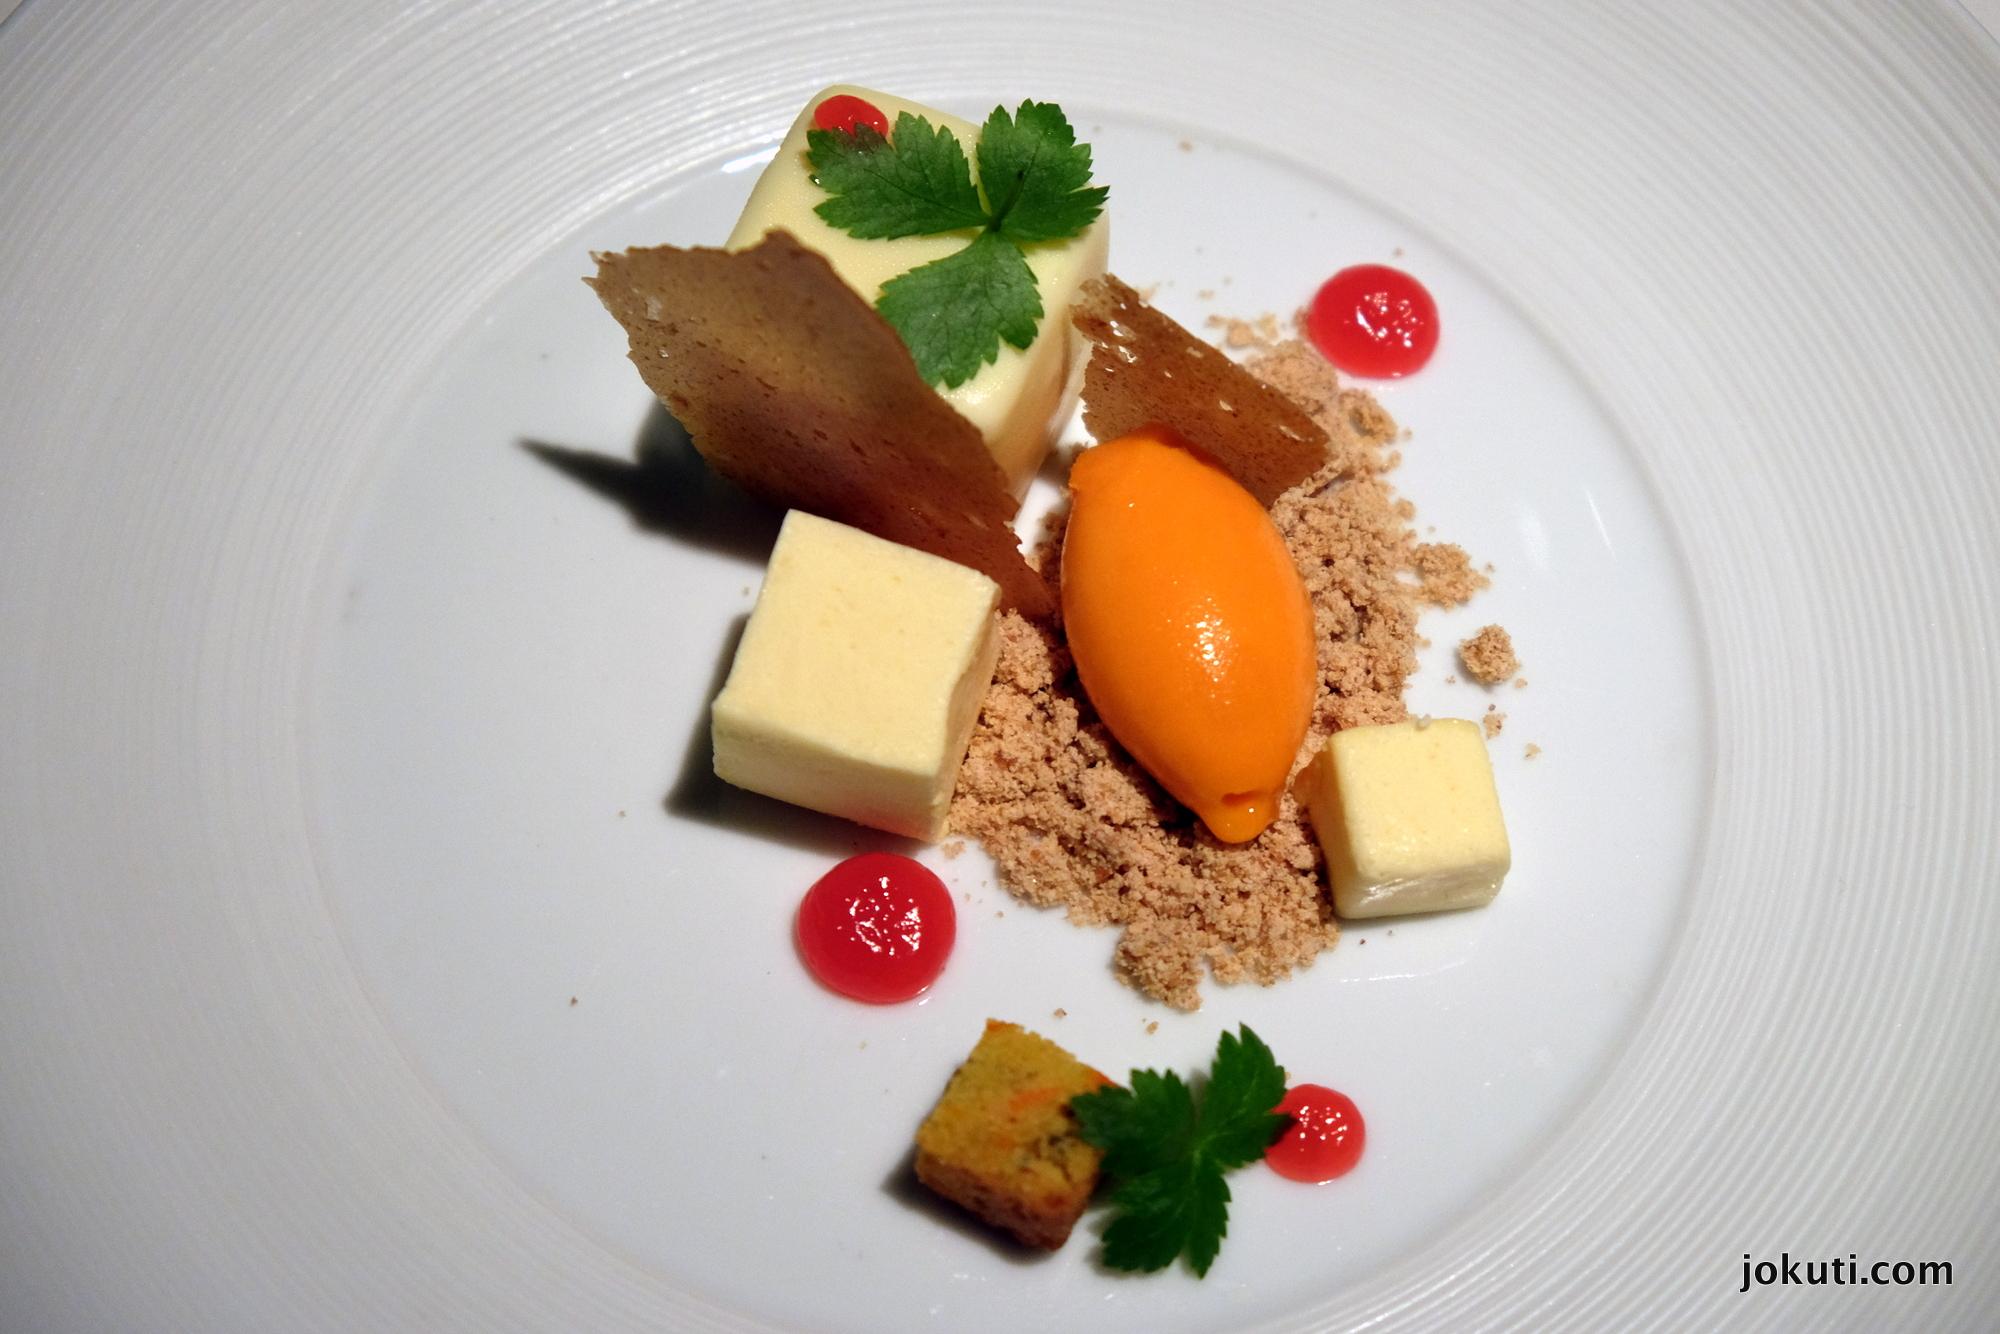 dscf5398_baraka_budapest_hungary_restaurant_vilagevo_jokuti.jpg